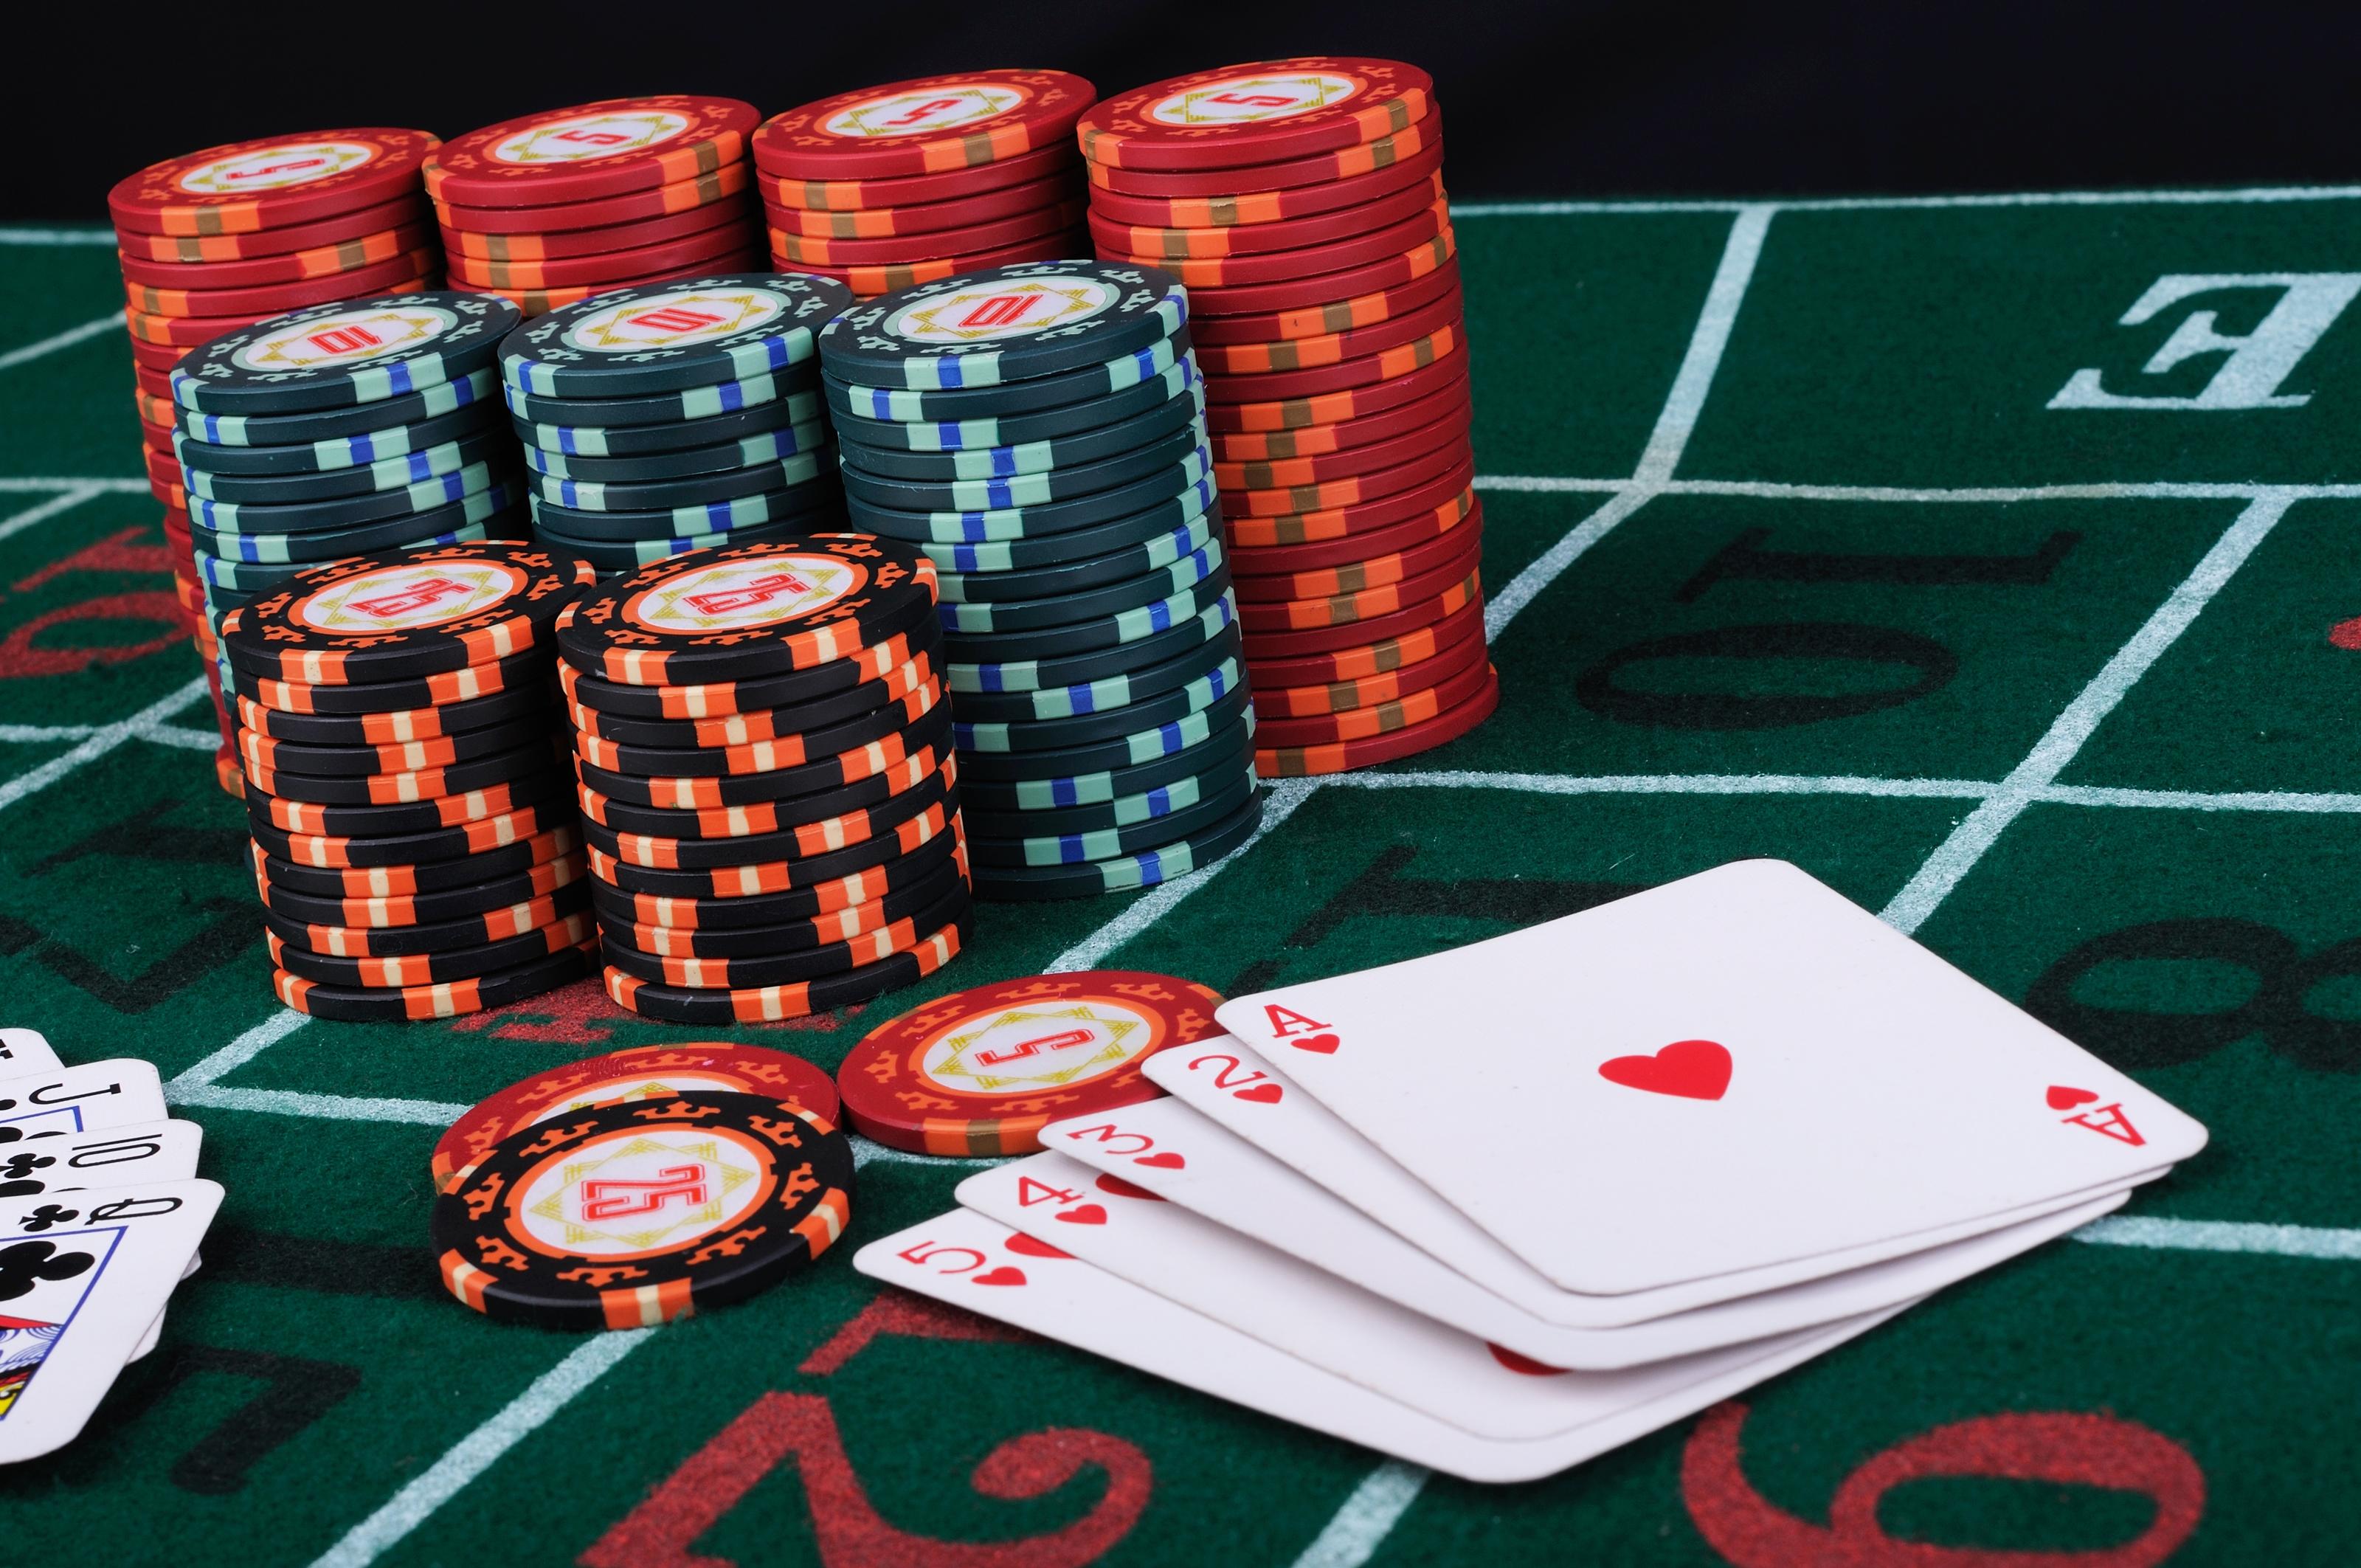 Tournoi de casino en ligne 485 en EUR sur 888 Casino